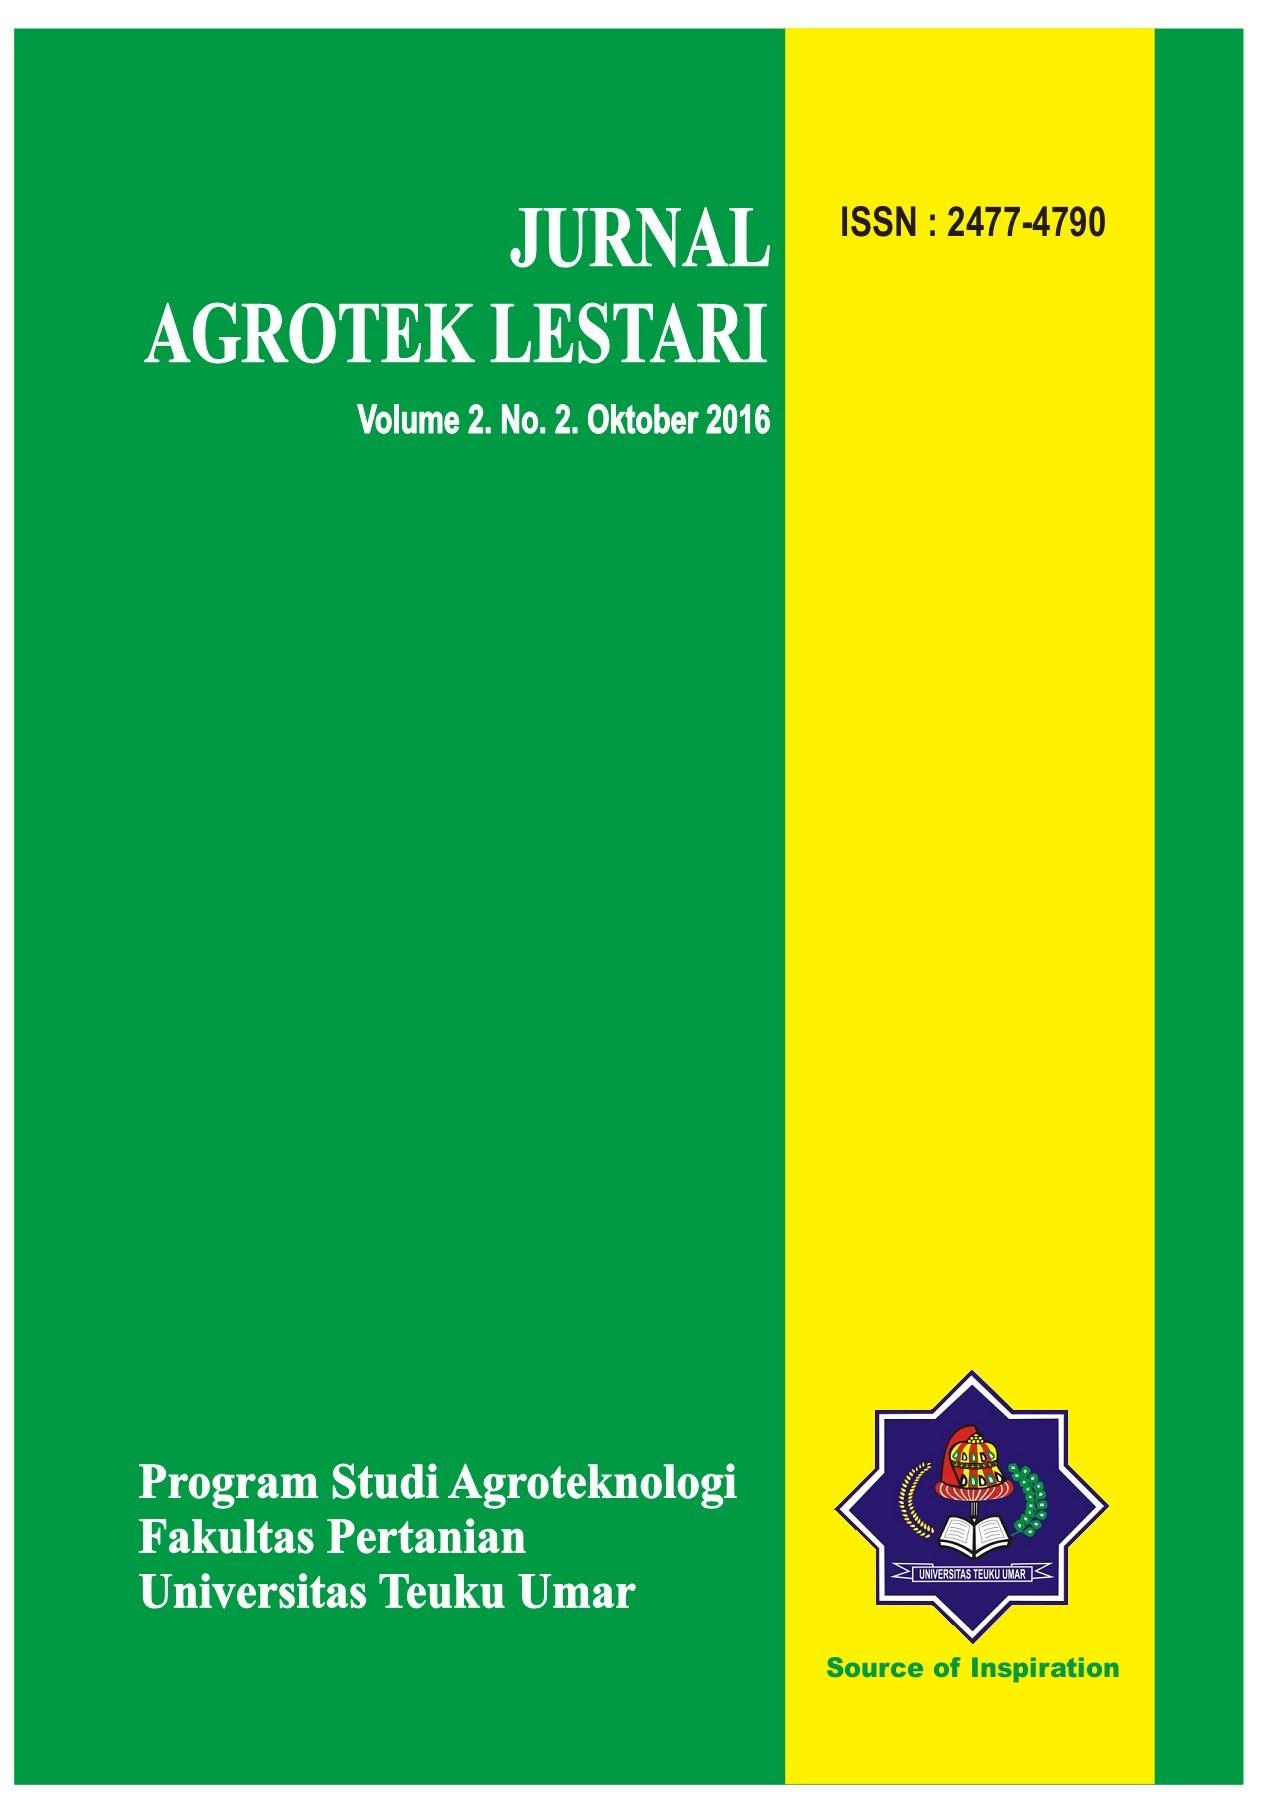 agrotek lestari vol 2, no 2, oktober 2016 pubhtml5  2 about agrotek #10